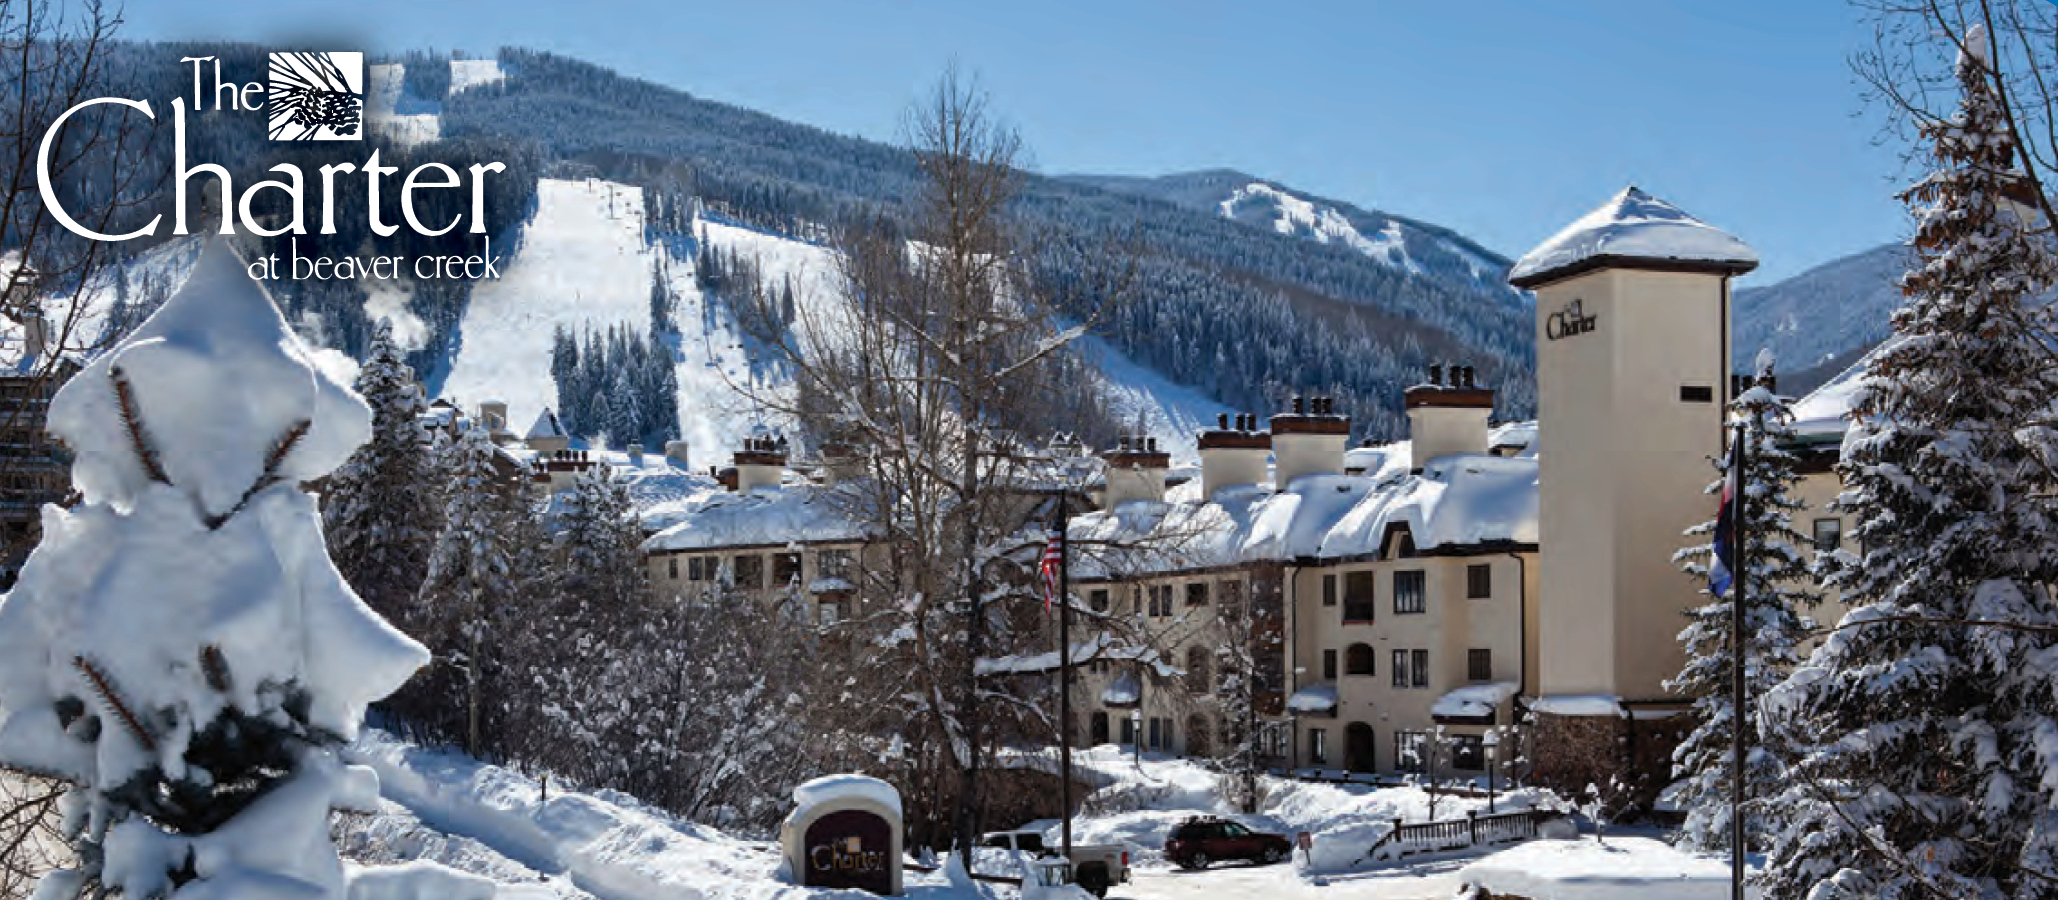 Pentagon Ski Club - Trips